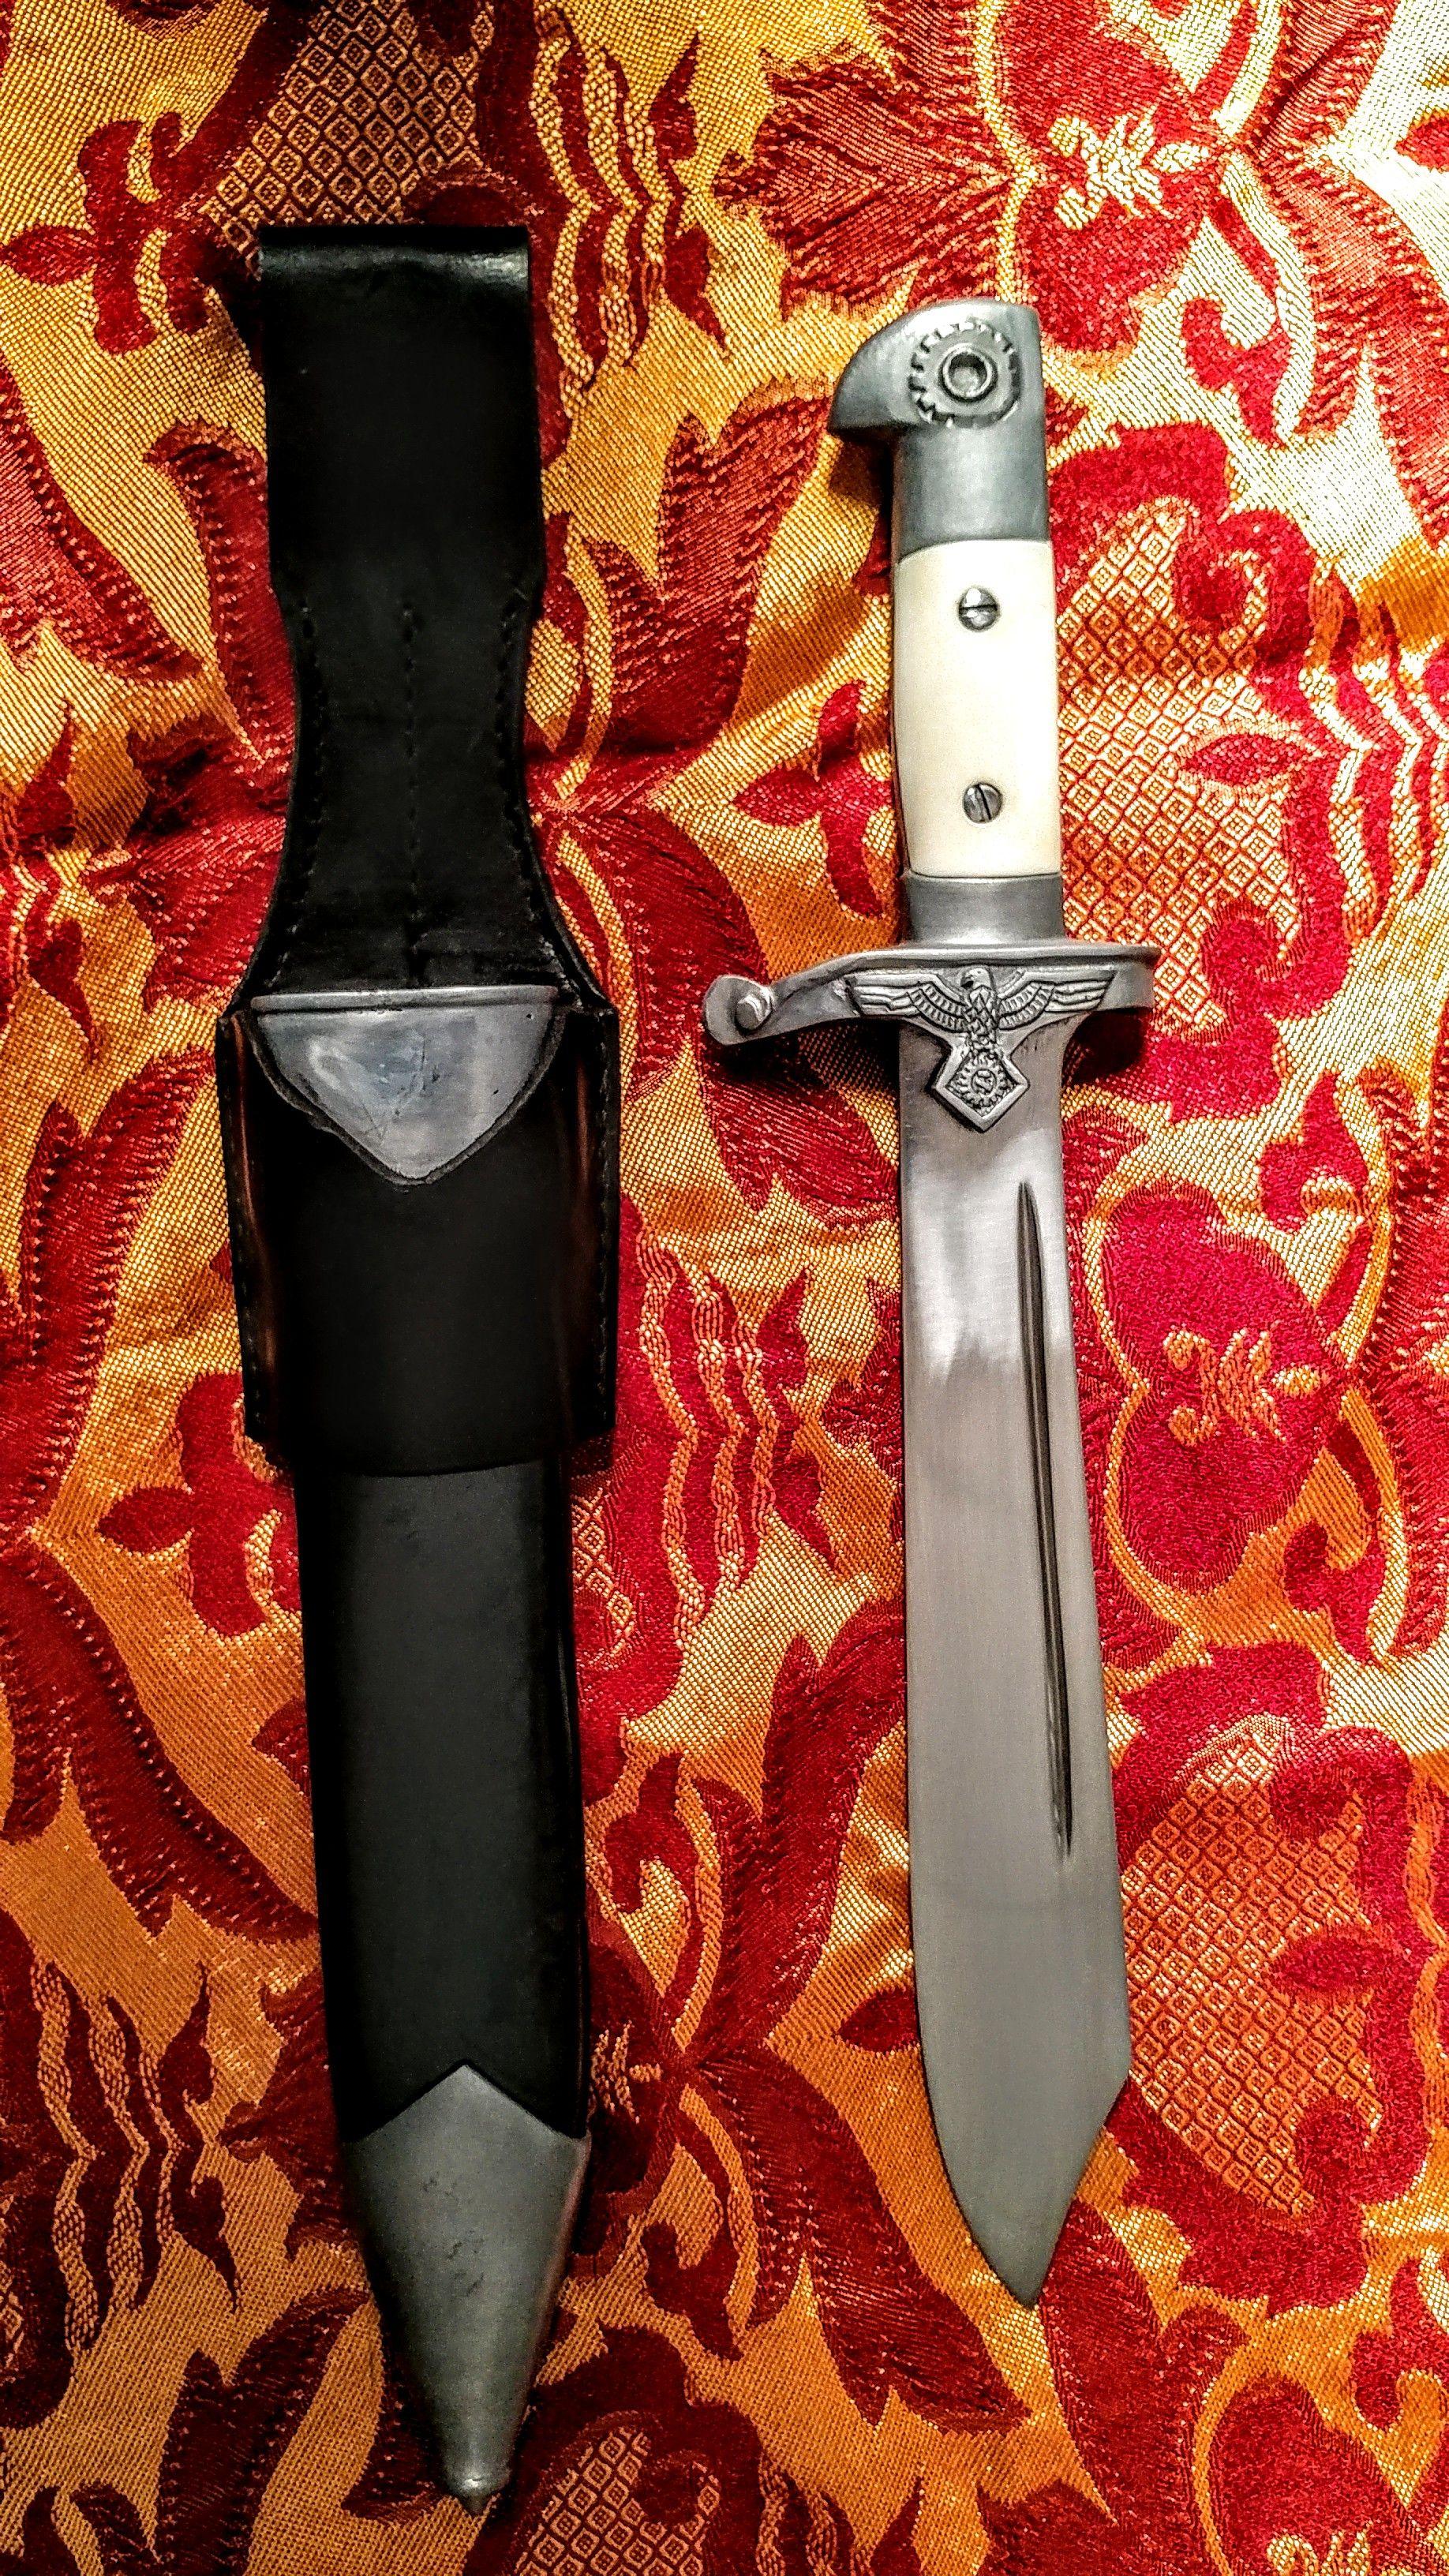 pin szerz u0151je  atlanta cutlery corp  k u00f6zz u00e9t u00e9ve itt  daggers